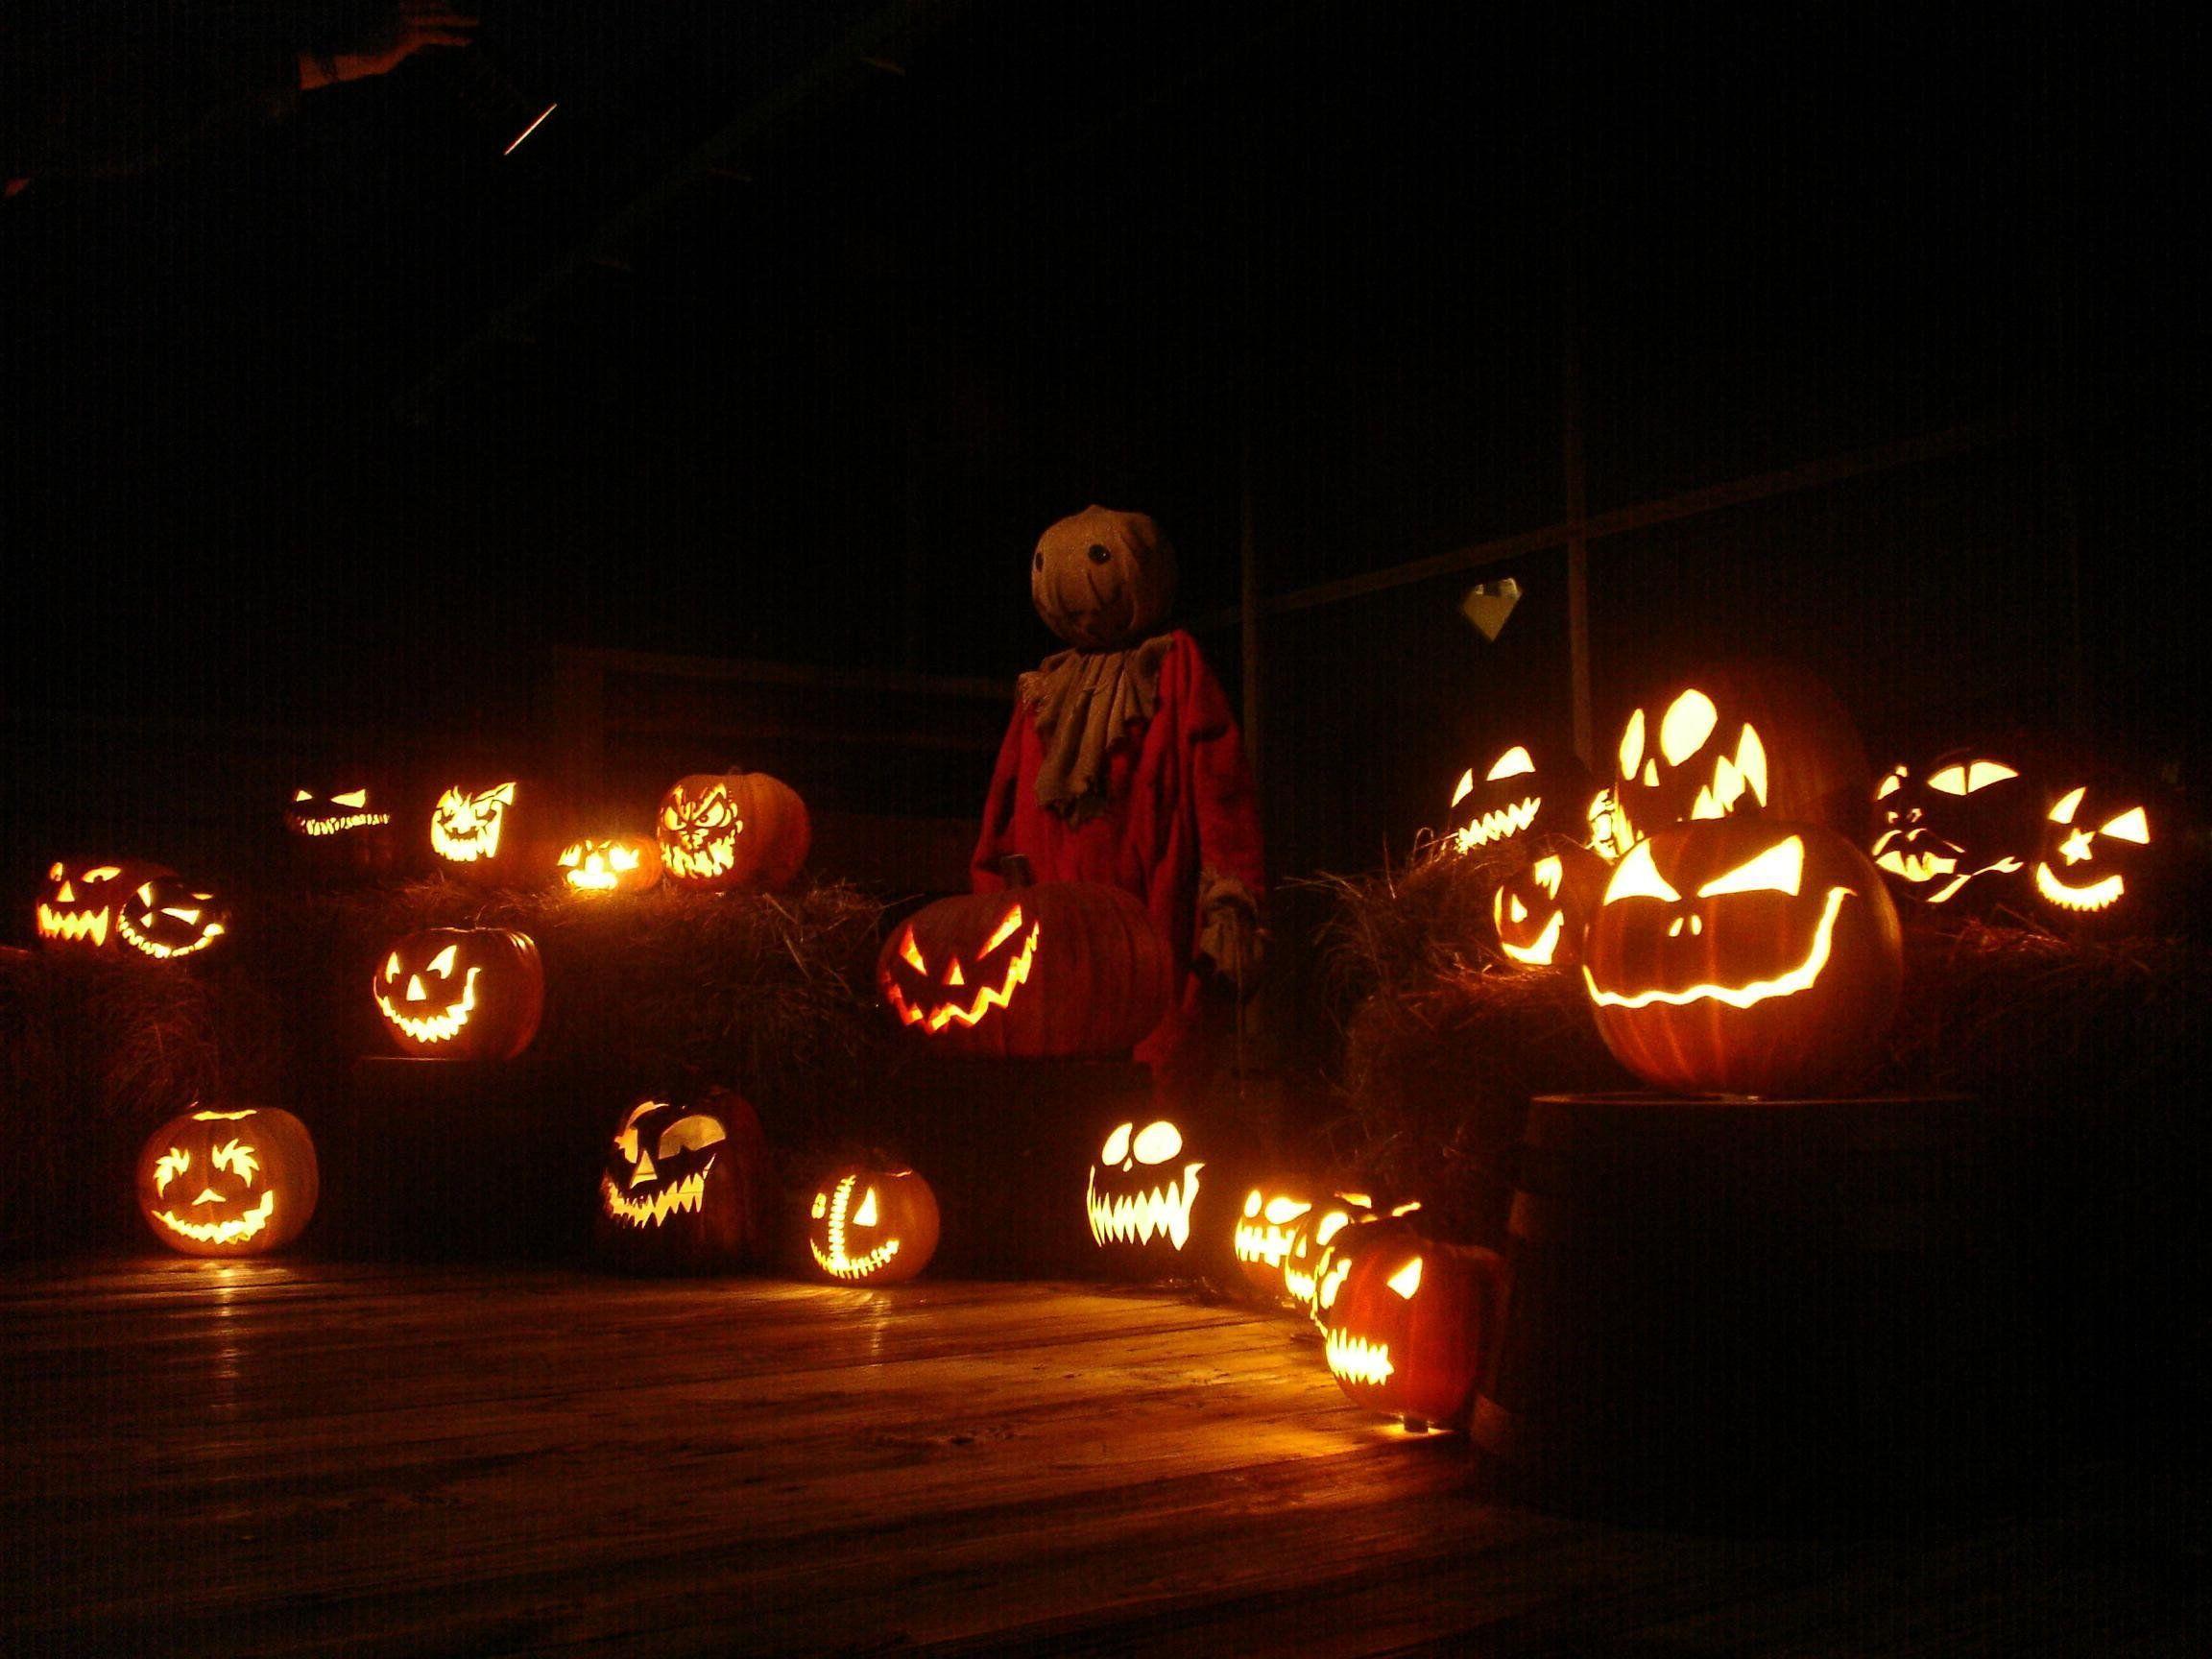 Halloween Trick Or Treat Wallpapers Wallpaper Cave